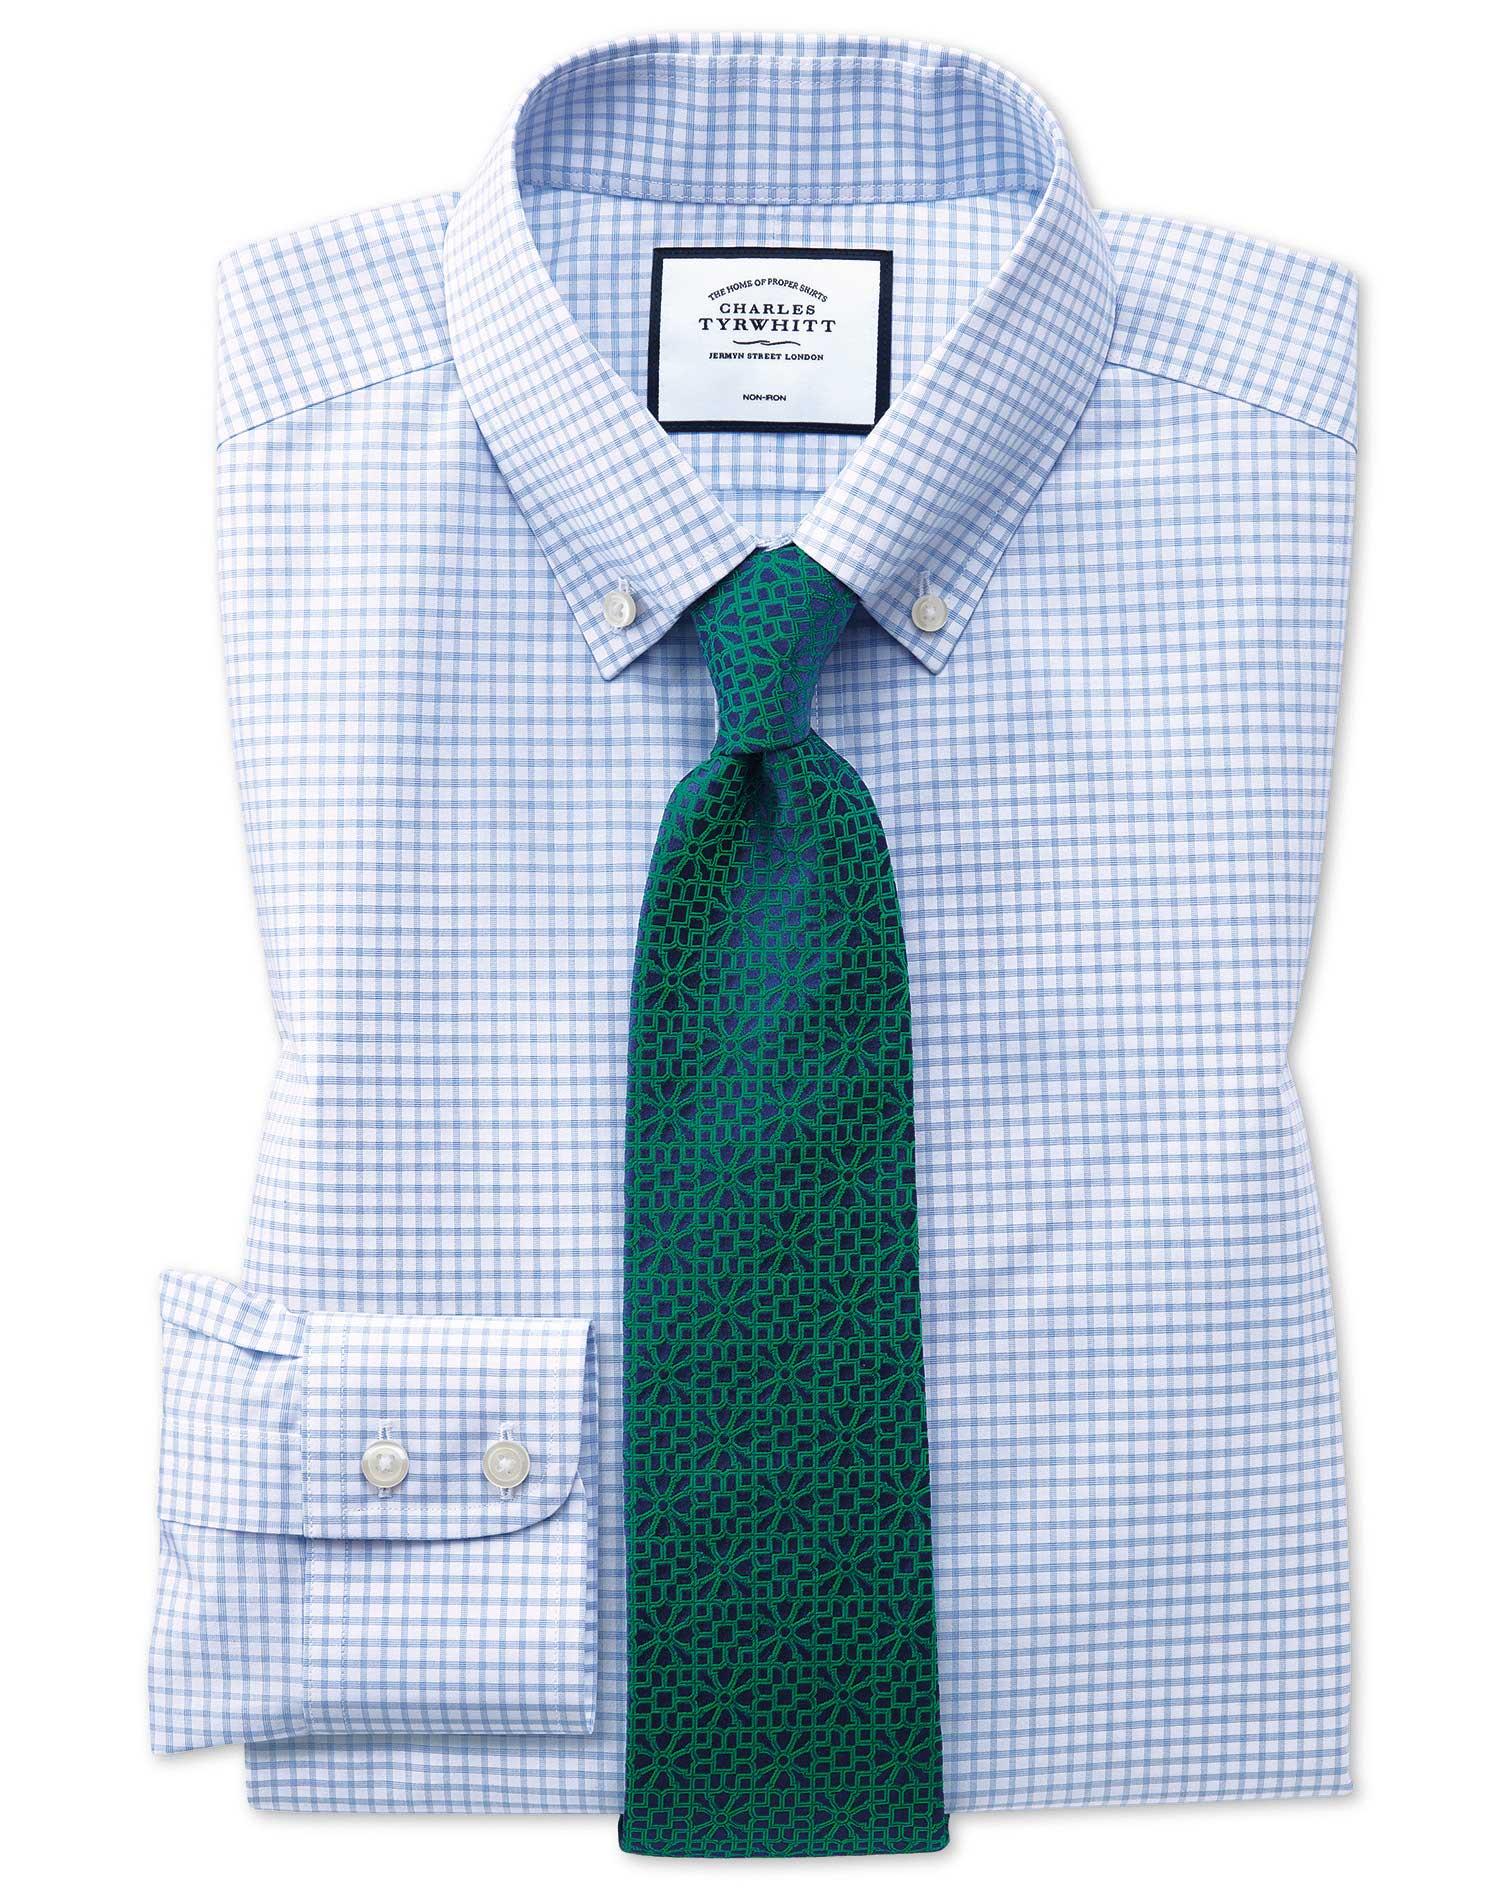 Slim Fit Button-Down Non-Iron Sky Blue Windowpane Check Cotton Formal Shirt Single Cuff Size 17/35 b